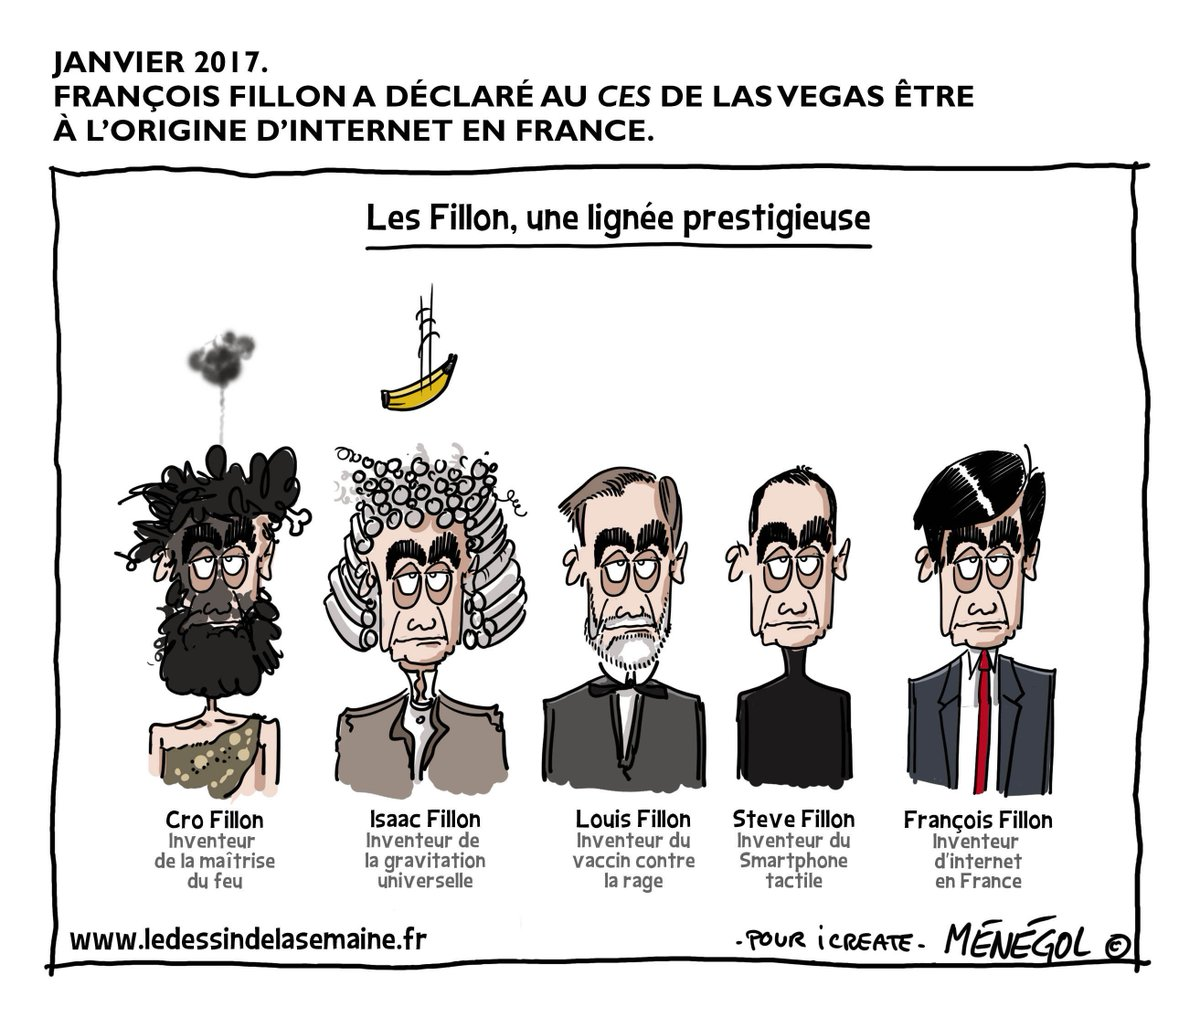 François Fillon à l&#39;origine d&#39;internet en France. #Fillon2017 @icreatefrance<br>http://pic.twitter.com/PKYrWkbwMZ